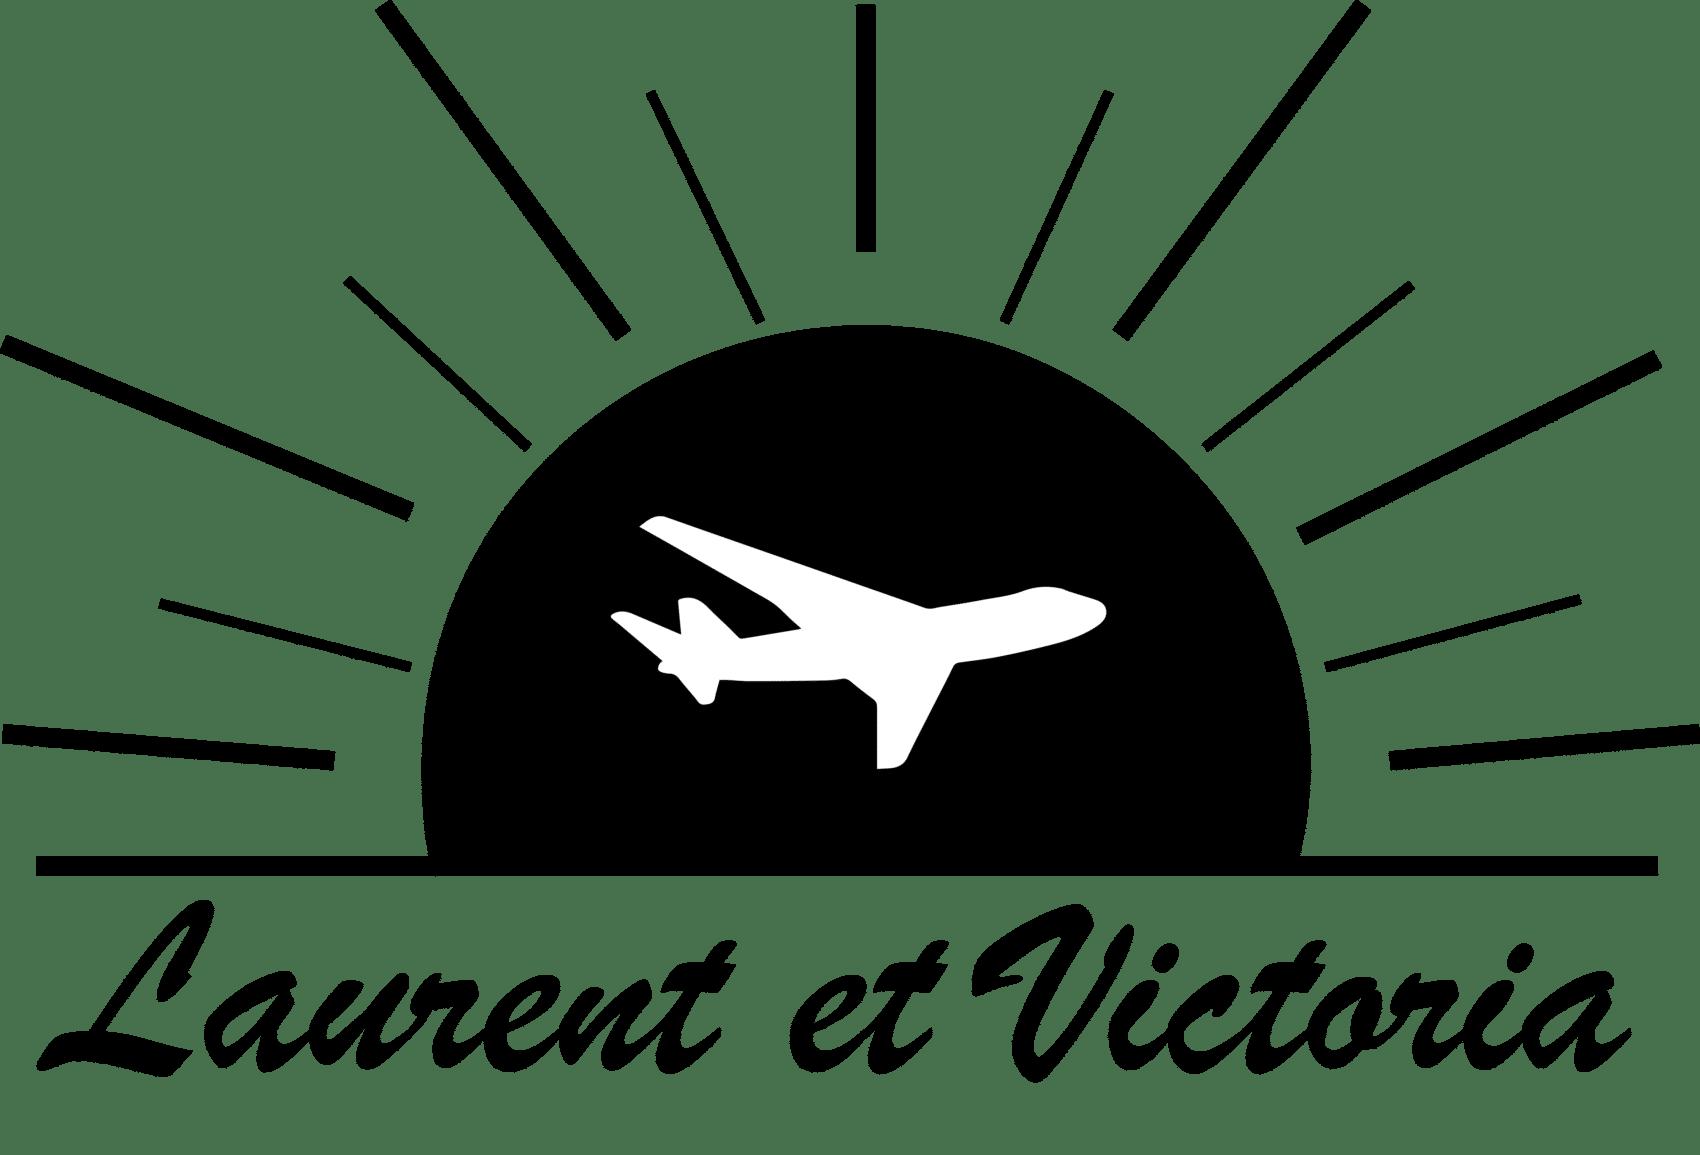 Laurent et Victoria en voyage